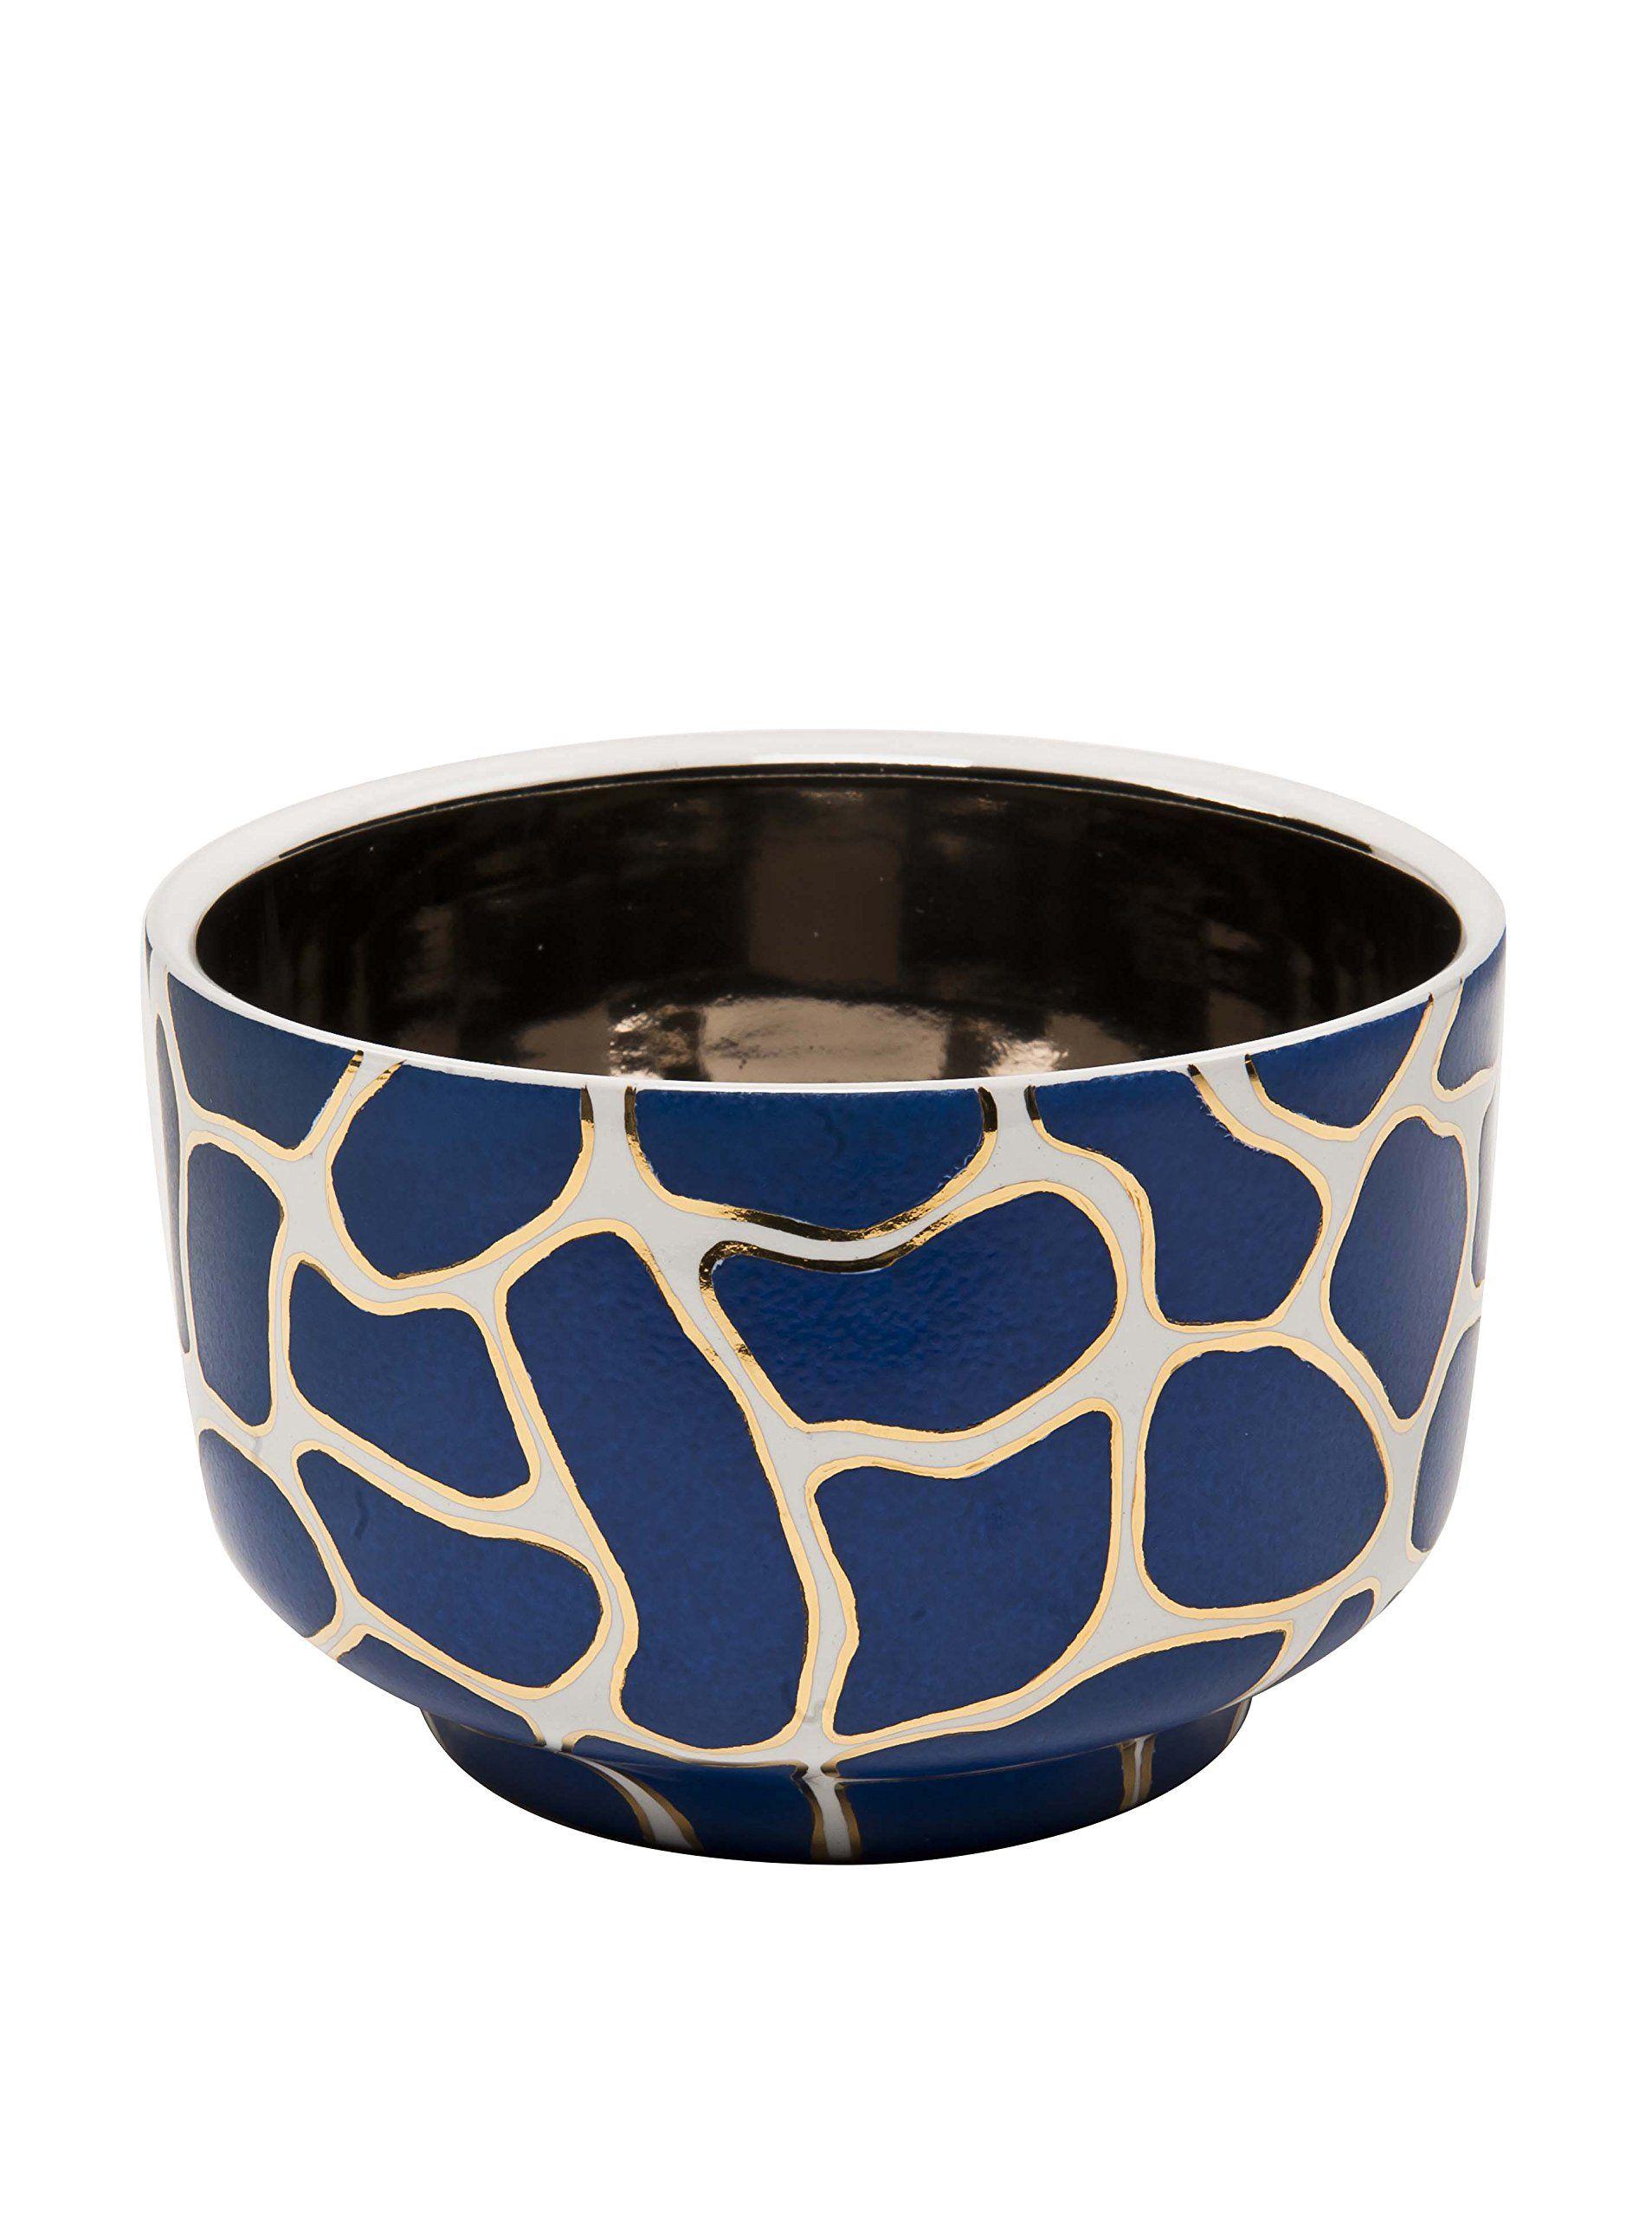 Waylande Gregory Large Giraffe Print Chubby Bowl, Blue/Platinum at MYHABIT